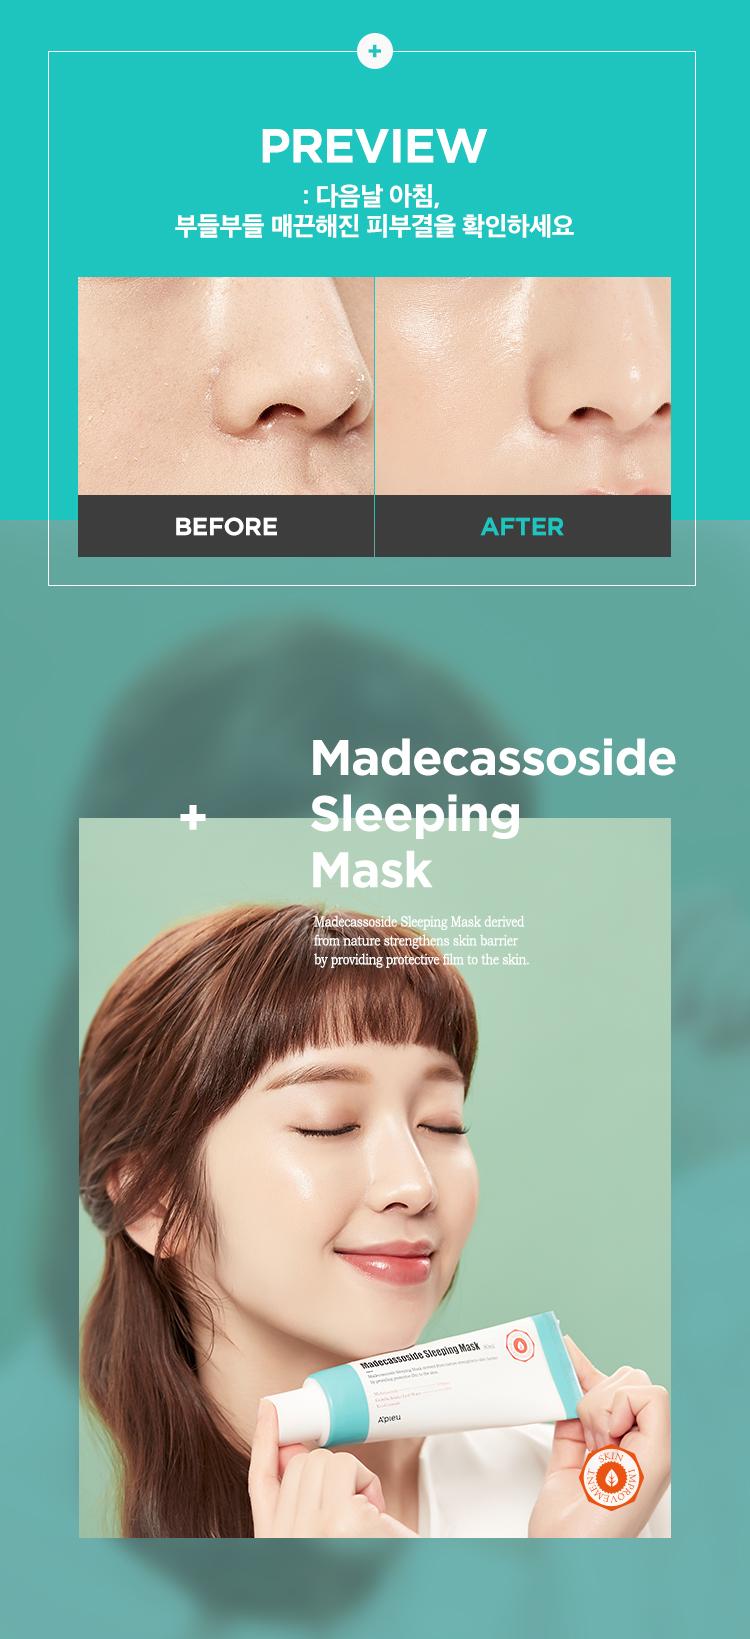 APIEU_Madecassoside_SleepingMask_02.jpg